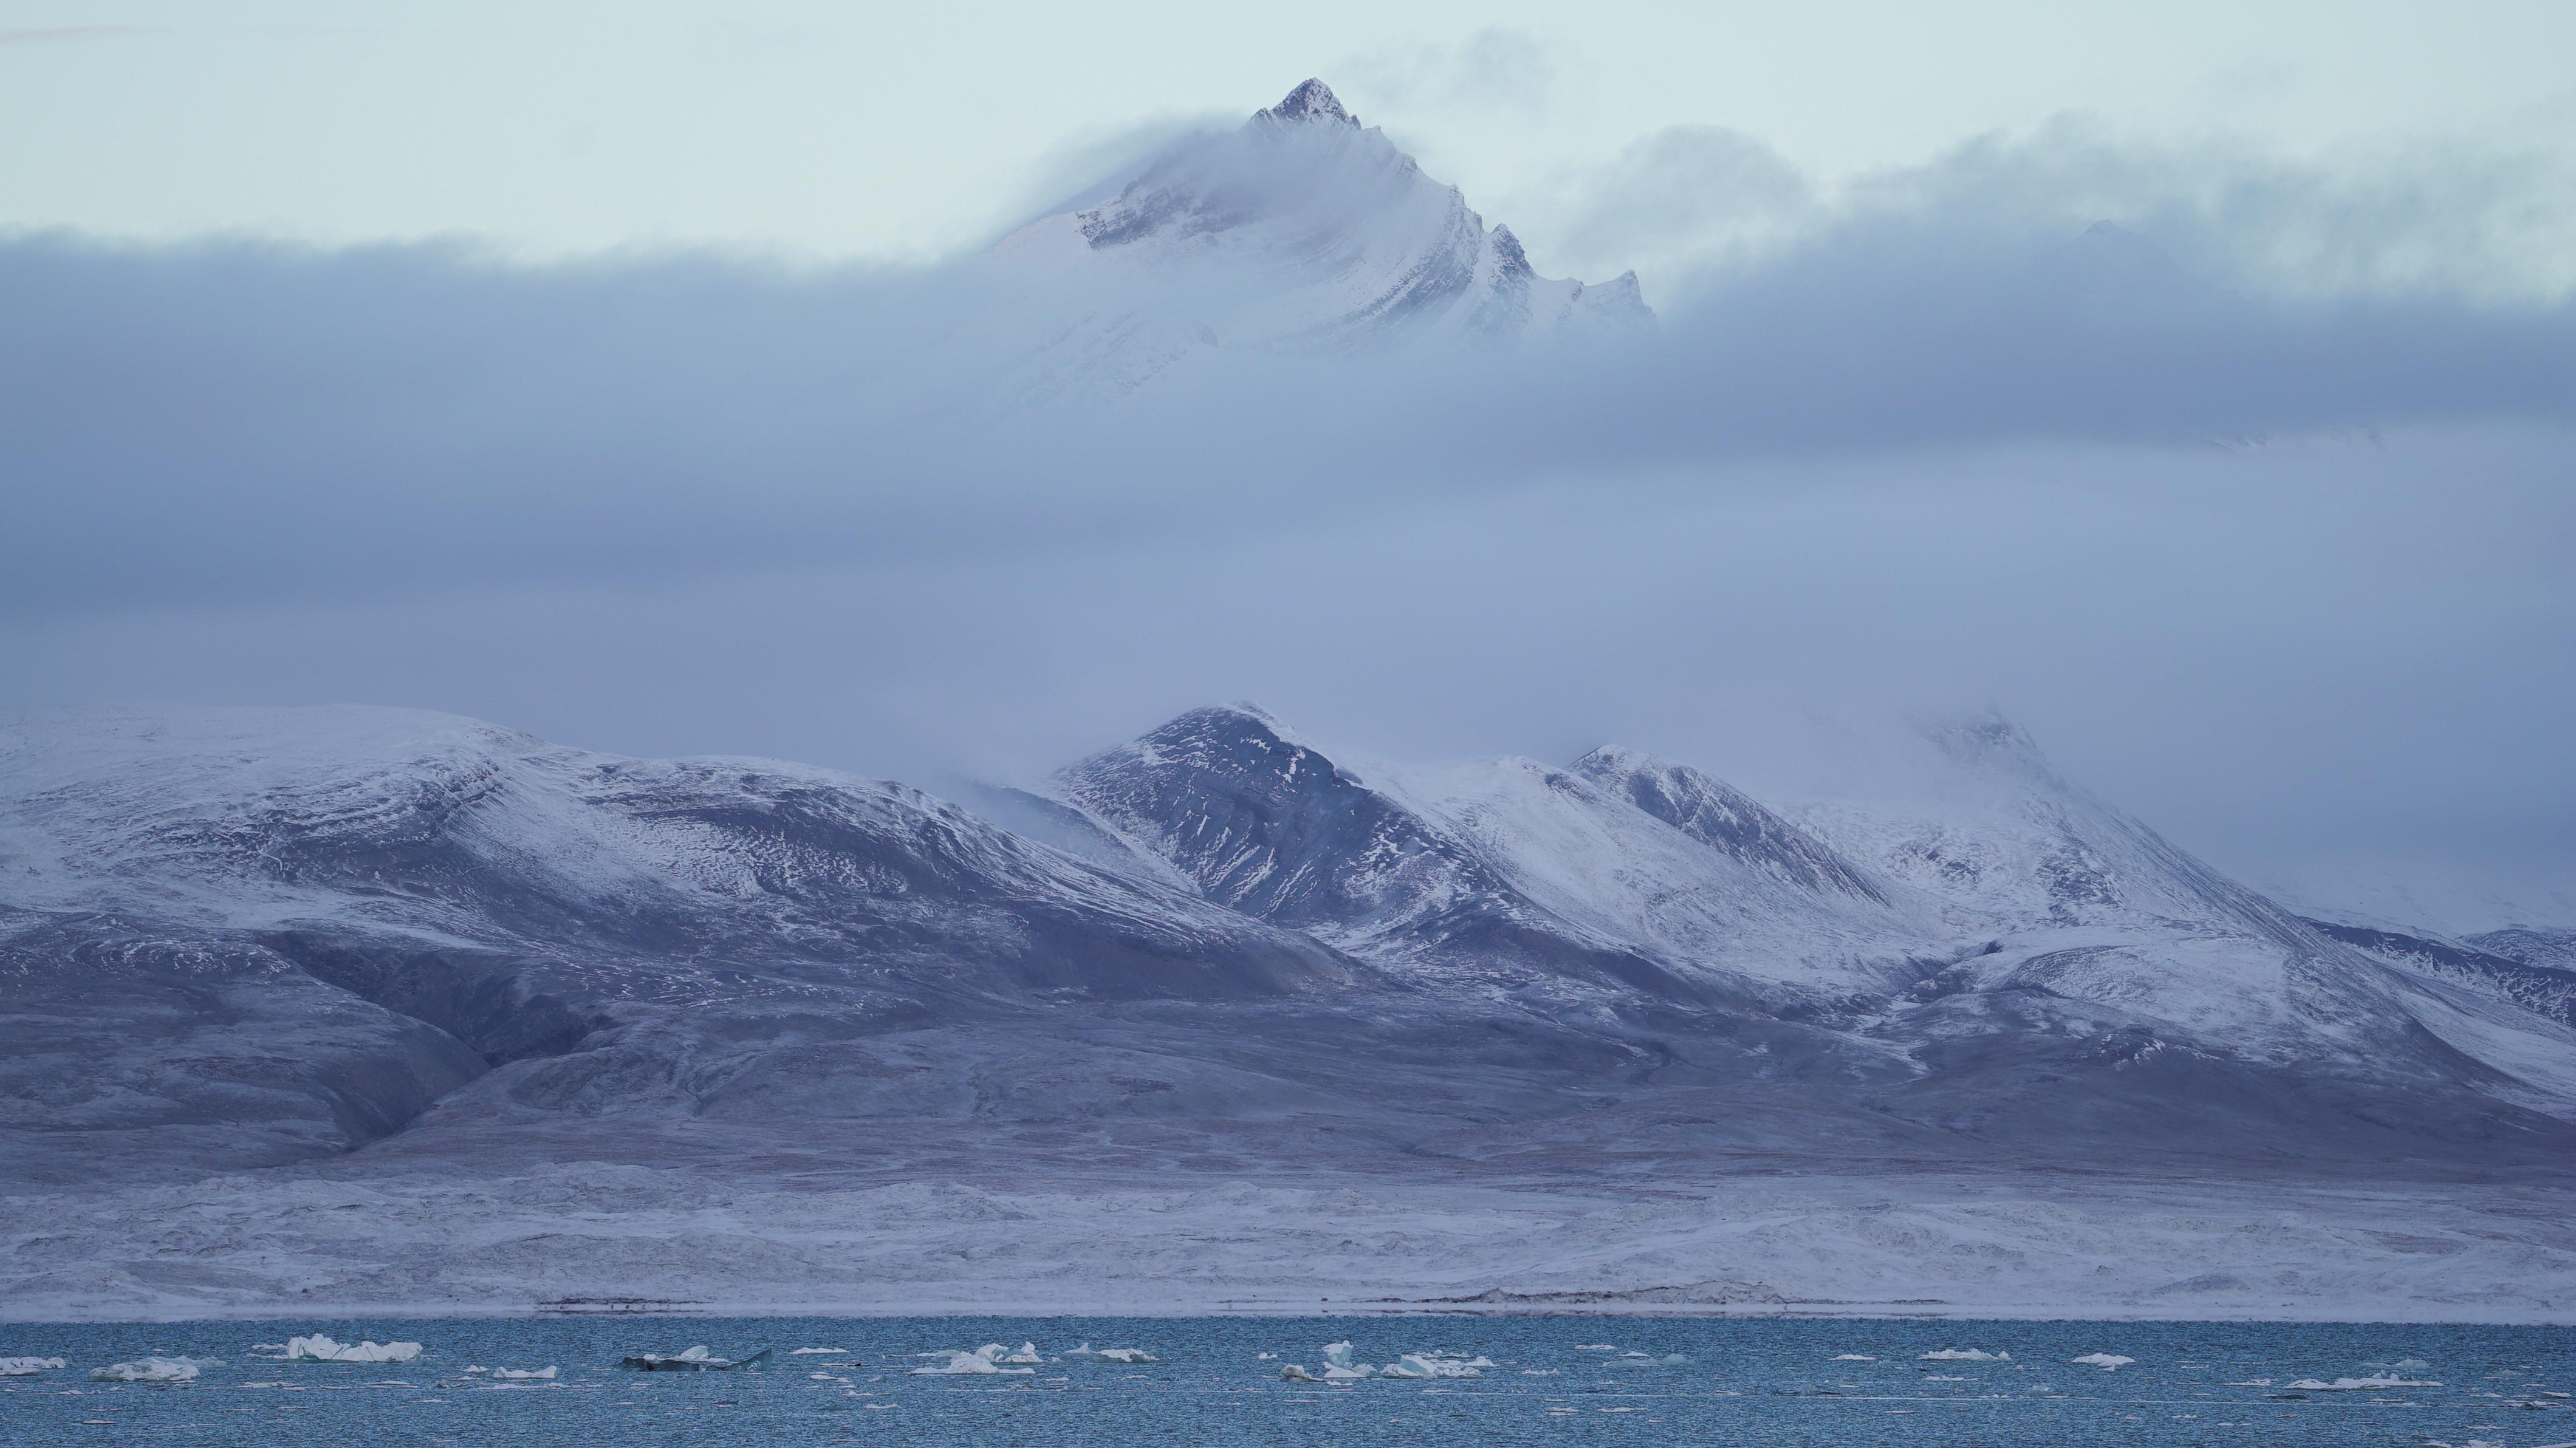 A view across Yoldiabukta Bay towards Spitsbergen island, part of the Svalbard archipelago in northern Norway, September 27, 2020. Picture taken September 27, 2020. REUTERS/Natalie Thomas - RC2N7J99MDEV